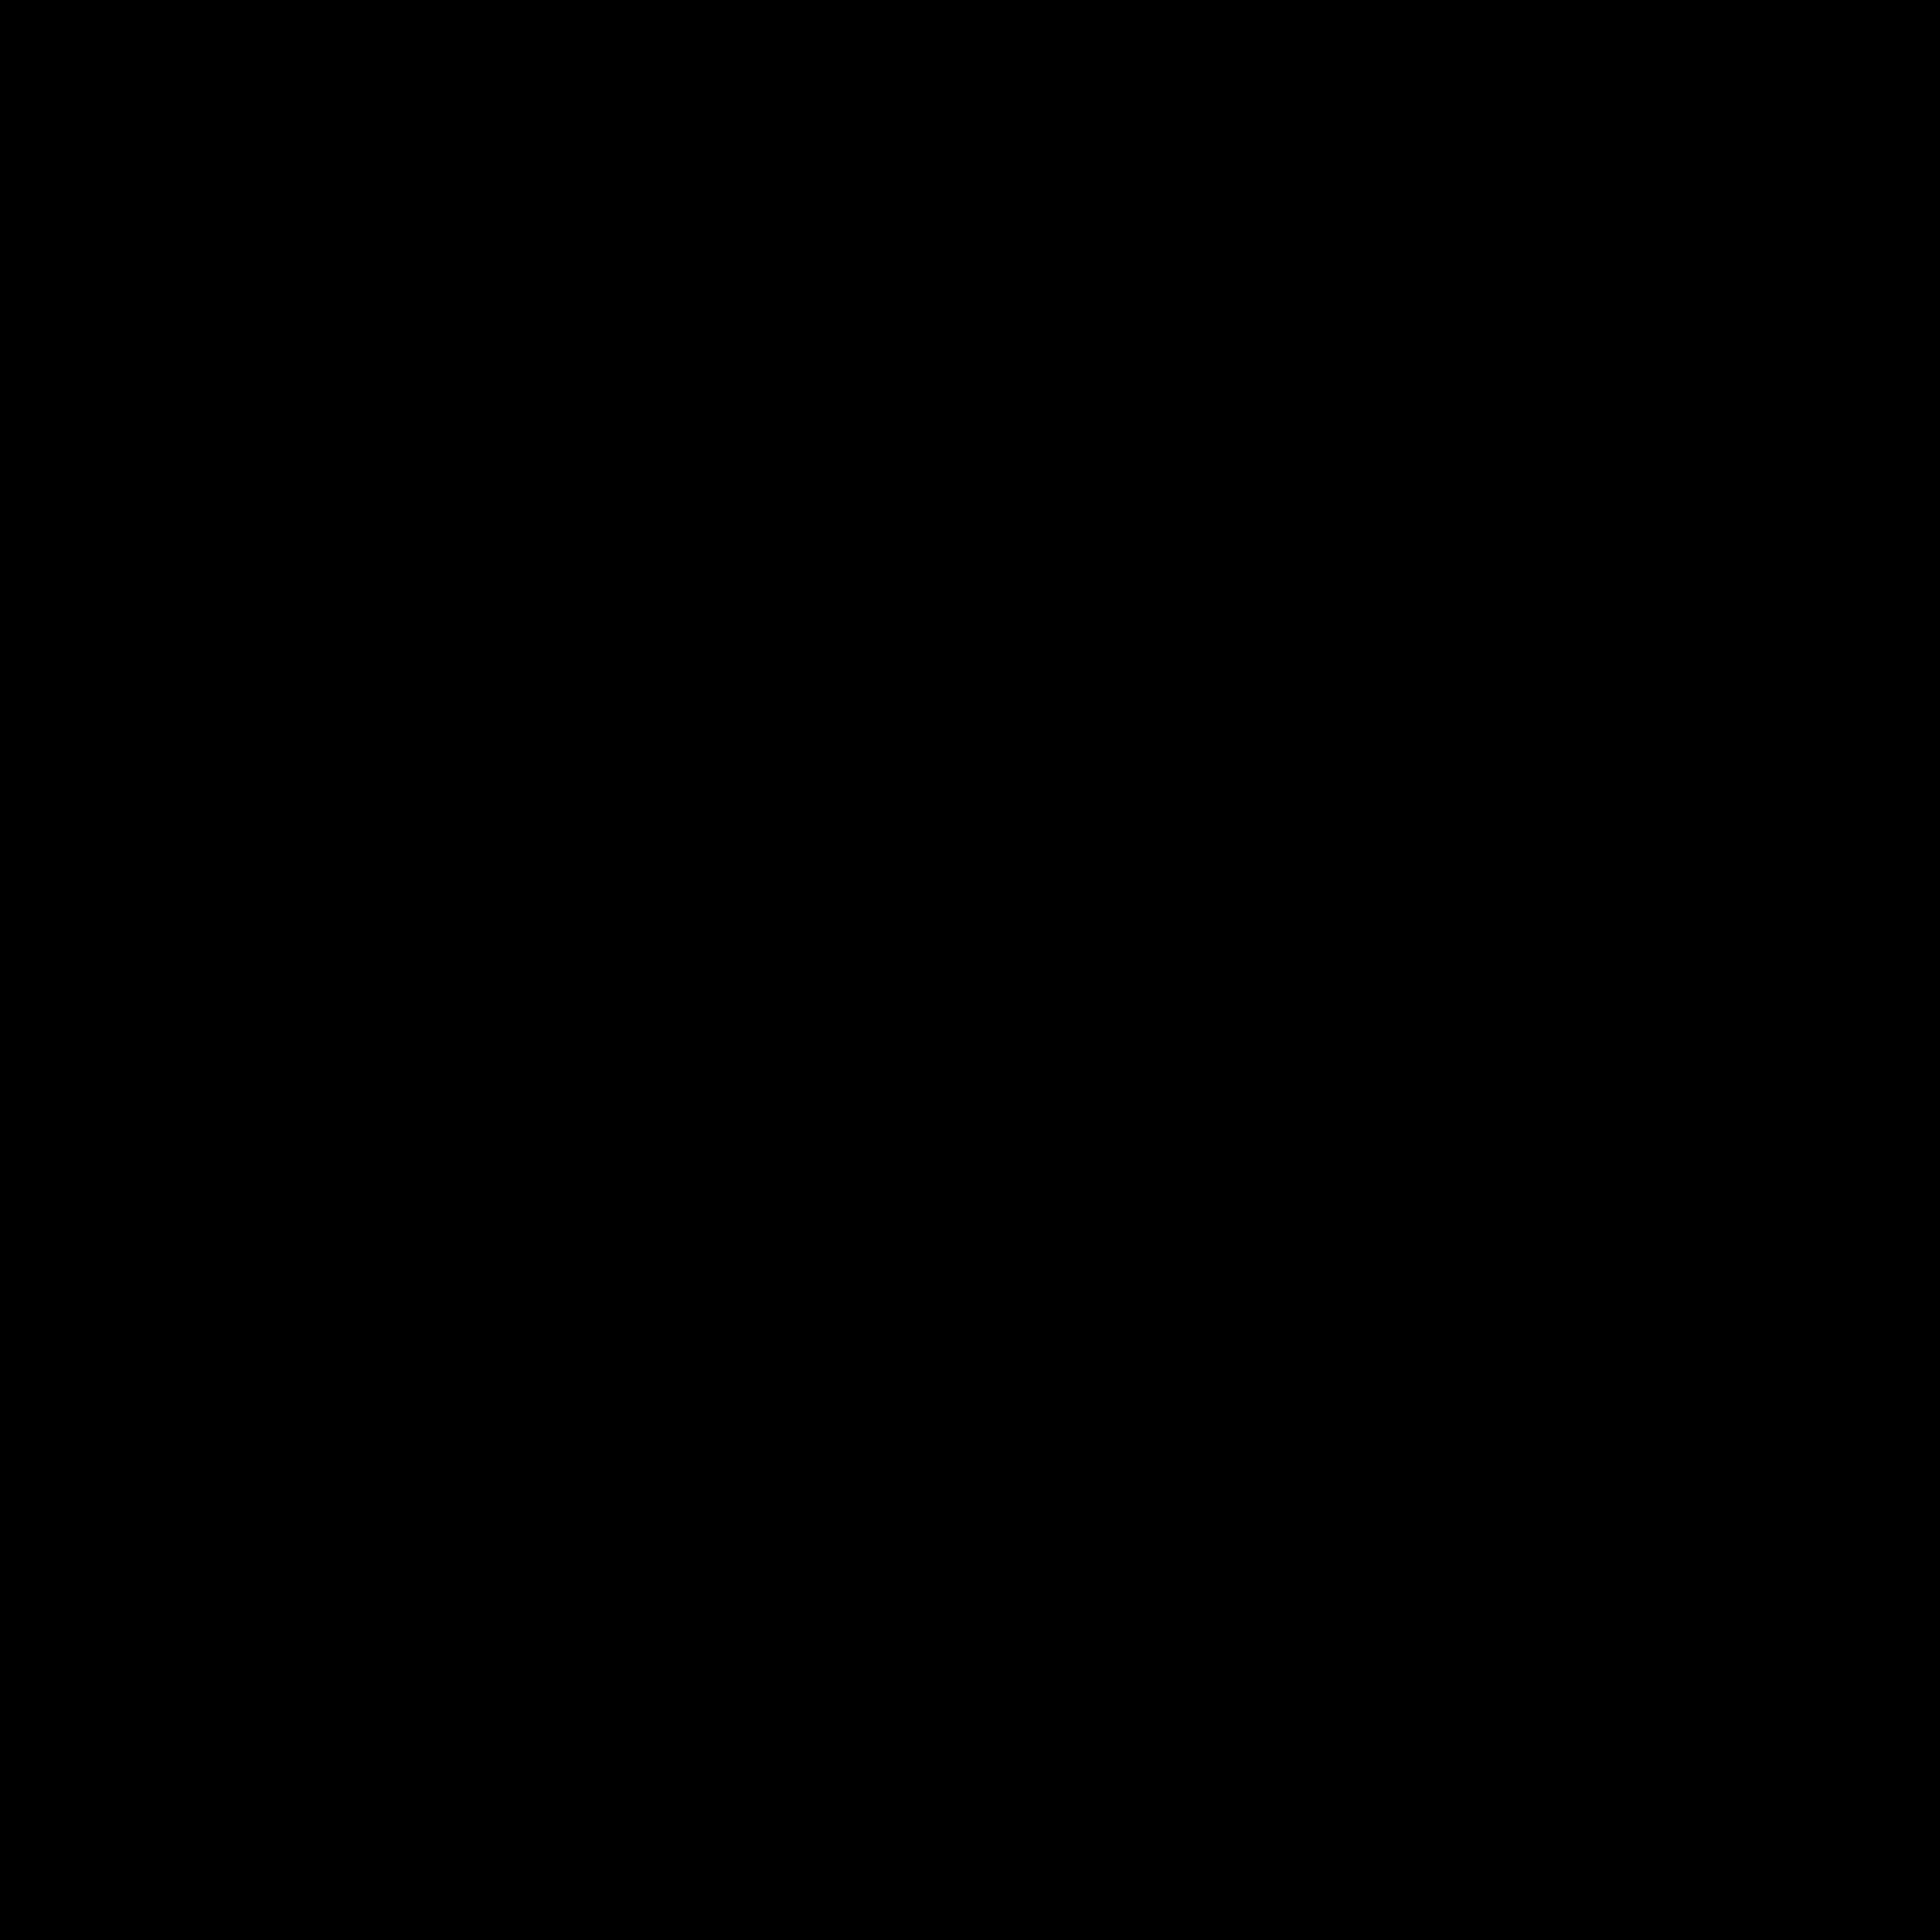 WalMart Logo PNG Transparent & SVG Vector - Freebie Supply